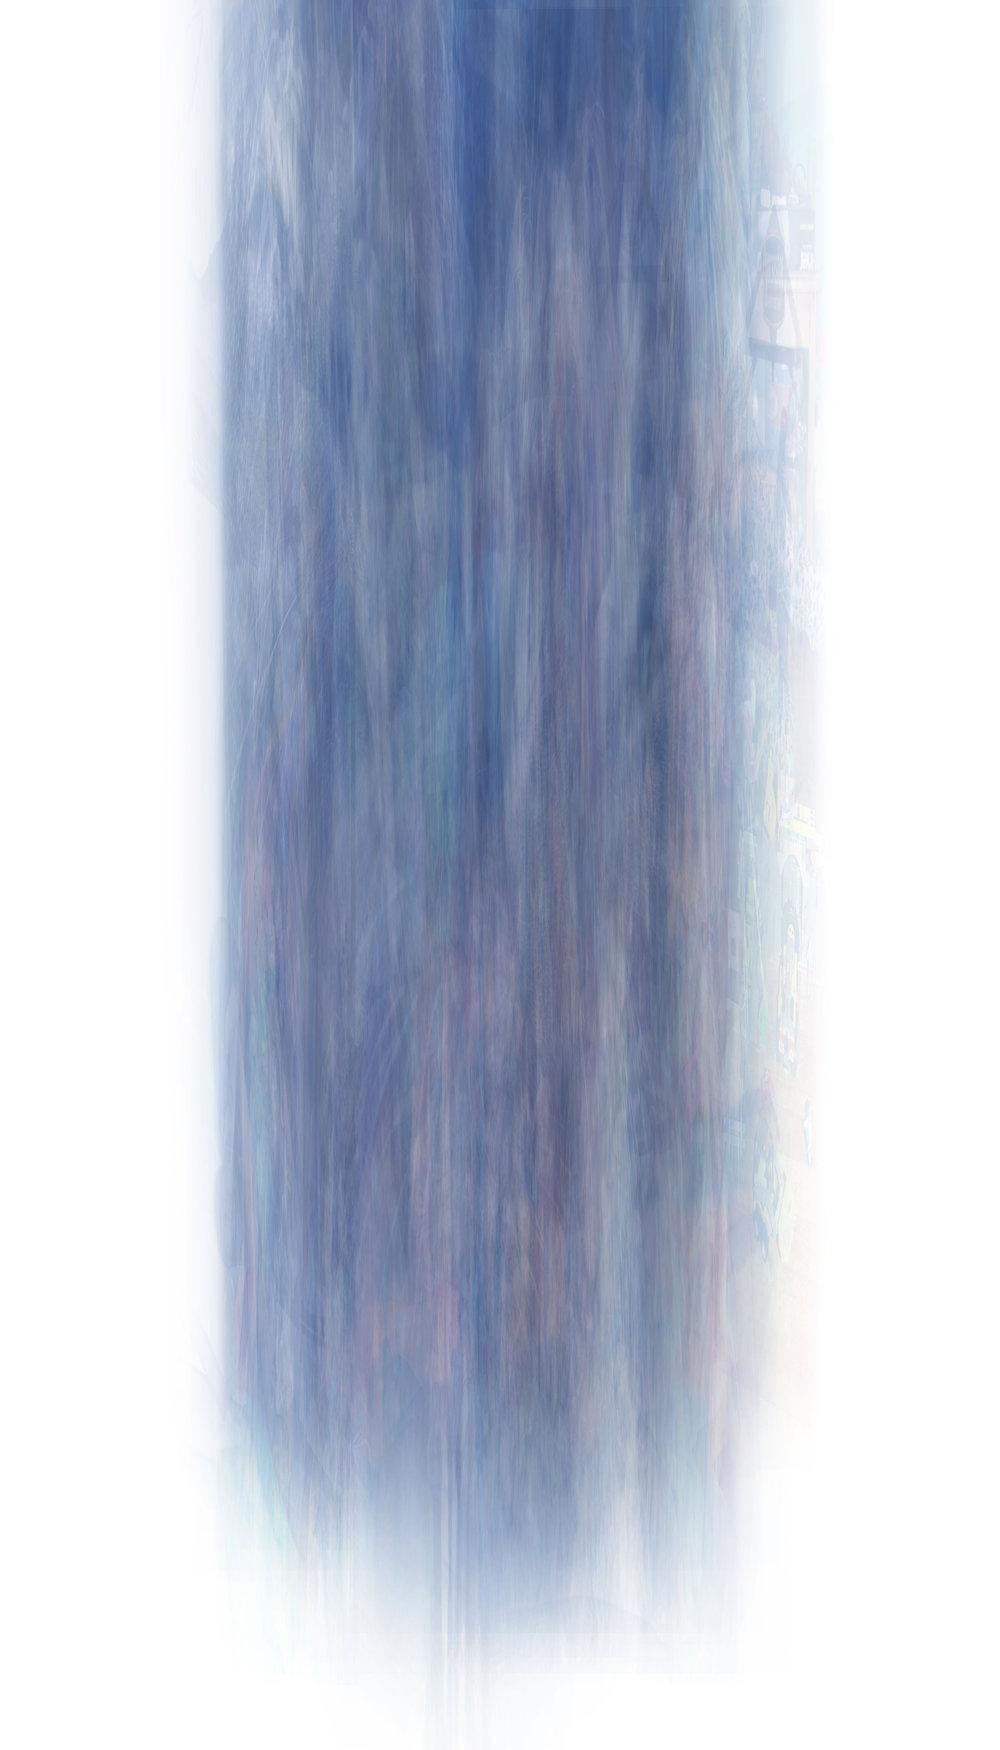 "Eroding History 5  Archival Pigment Print  63"" x 36"", 2018."